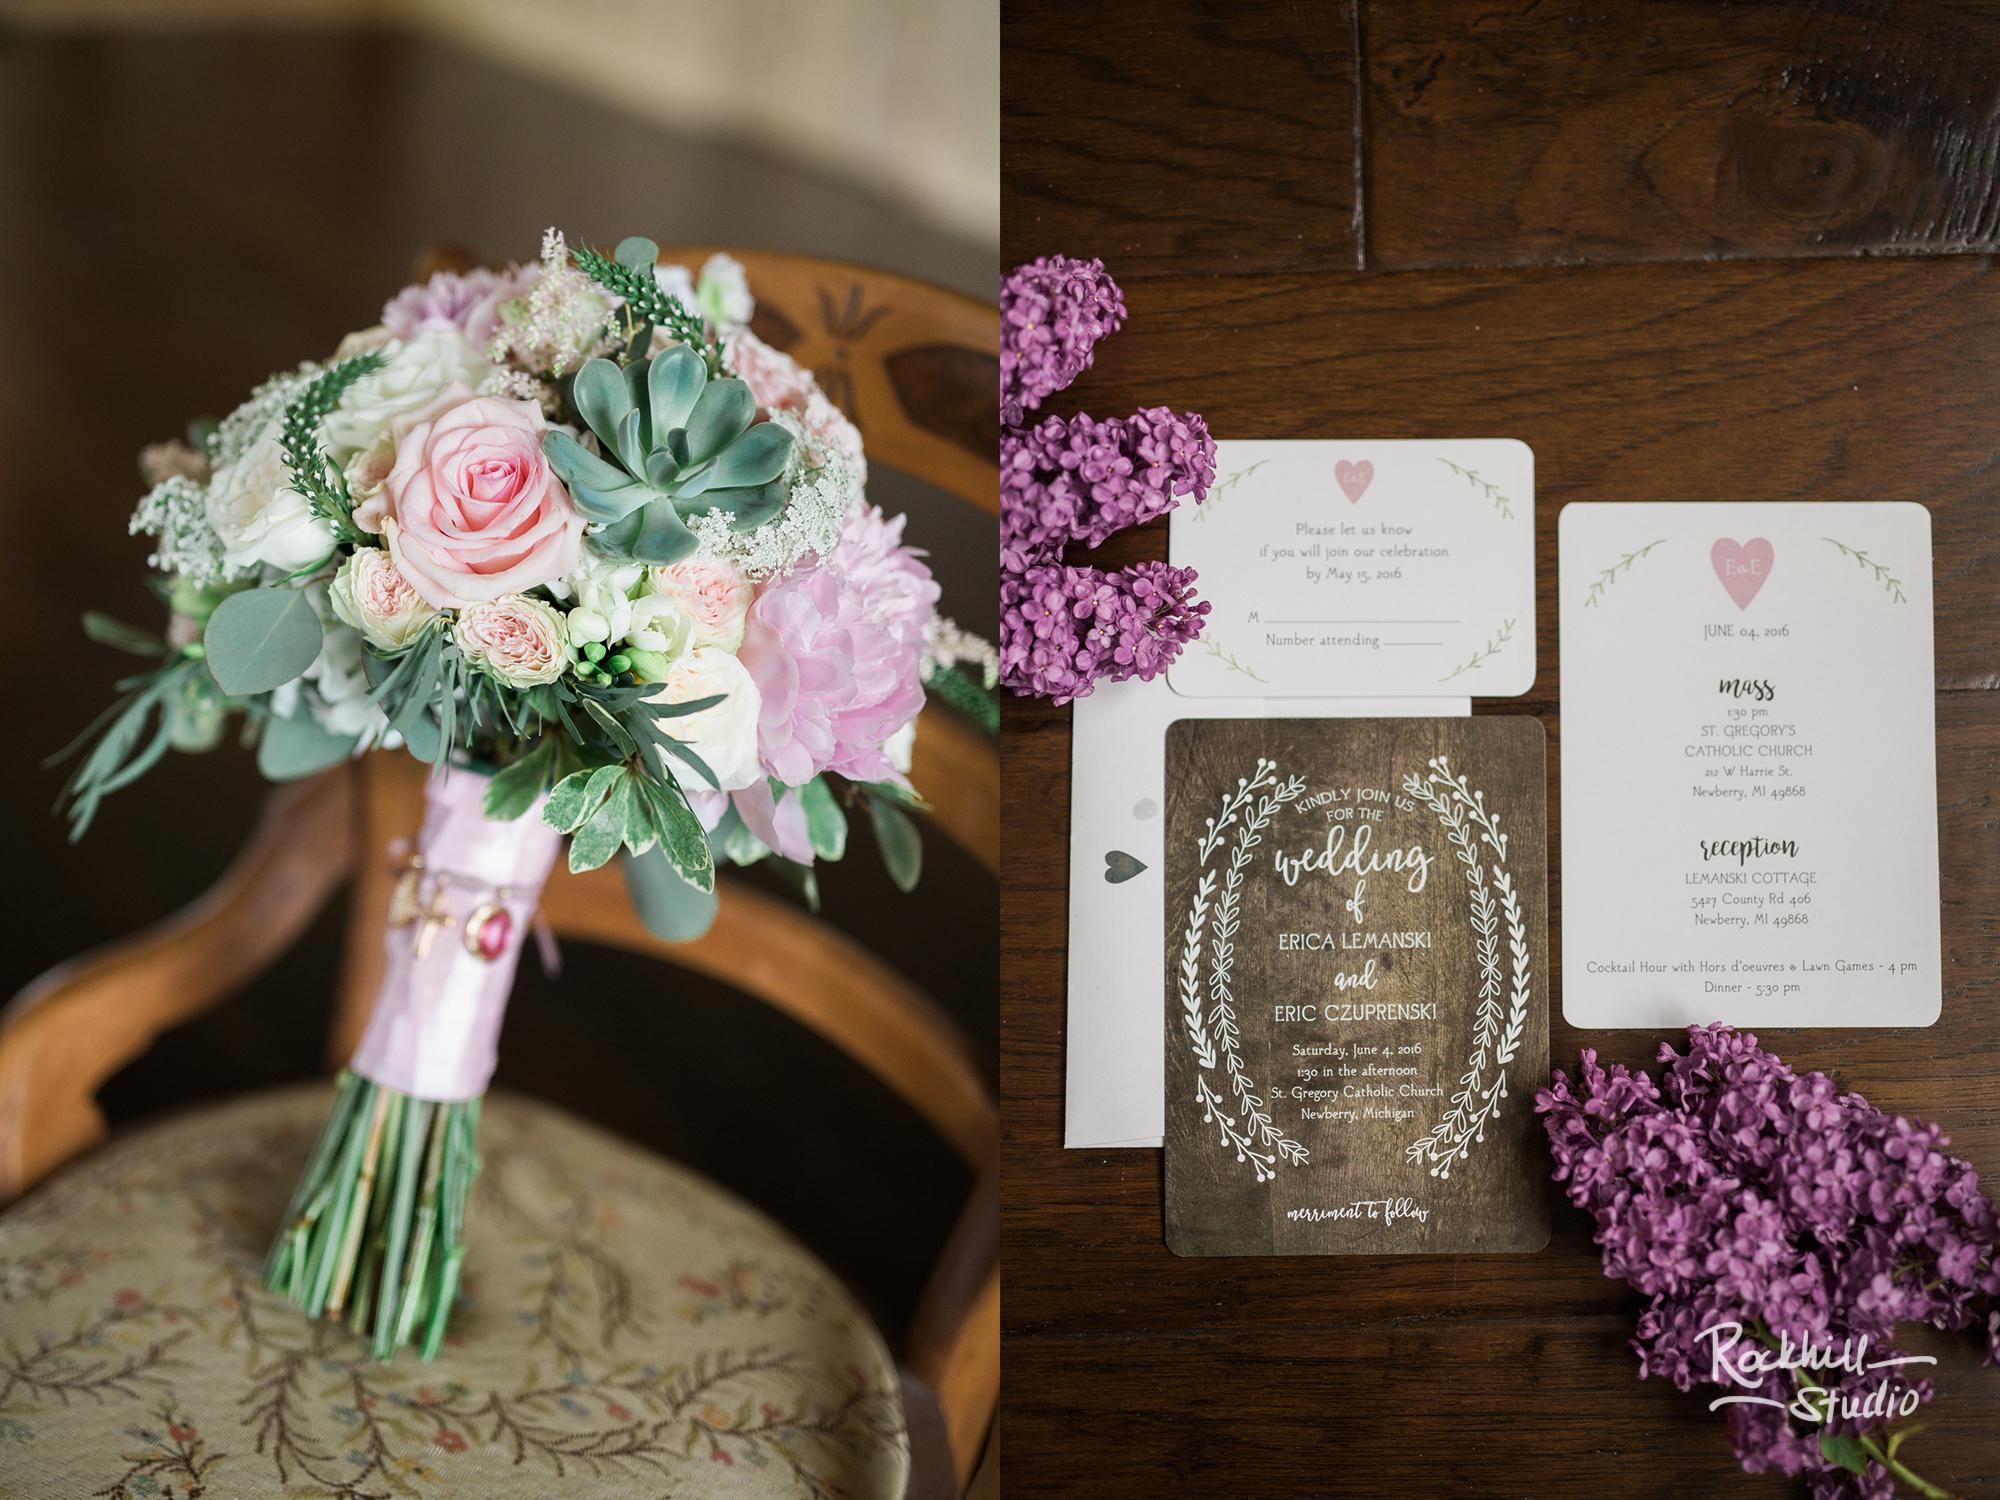 newberry-michigan-wedding-upper-peninsula-spring-photography-rockhill-ee-16.jpg